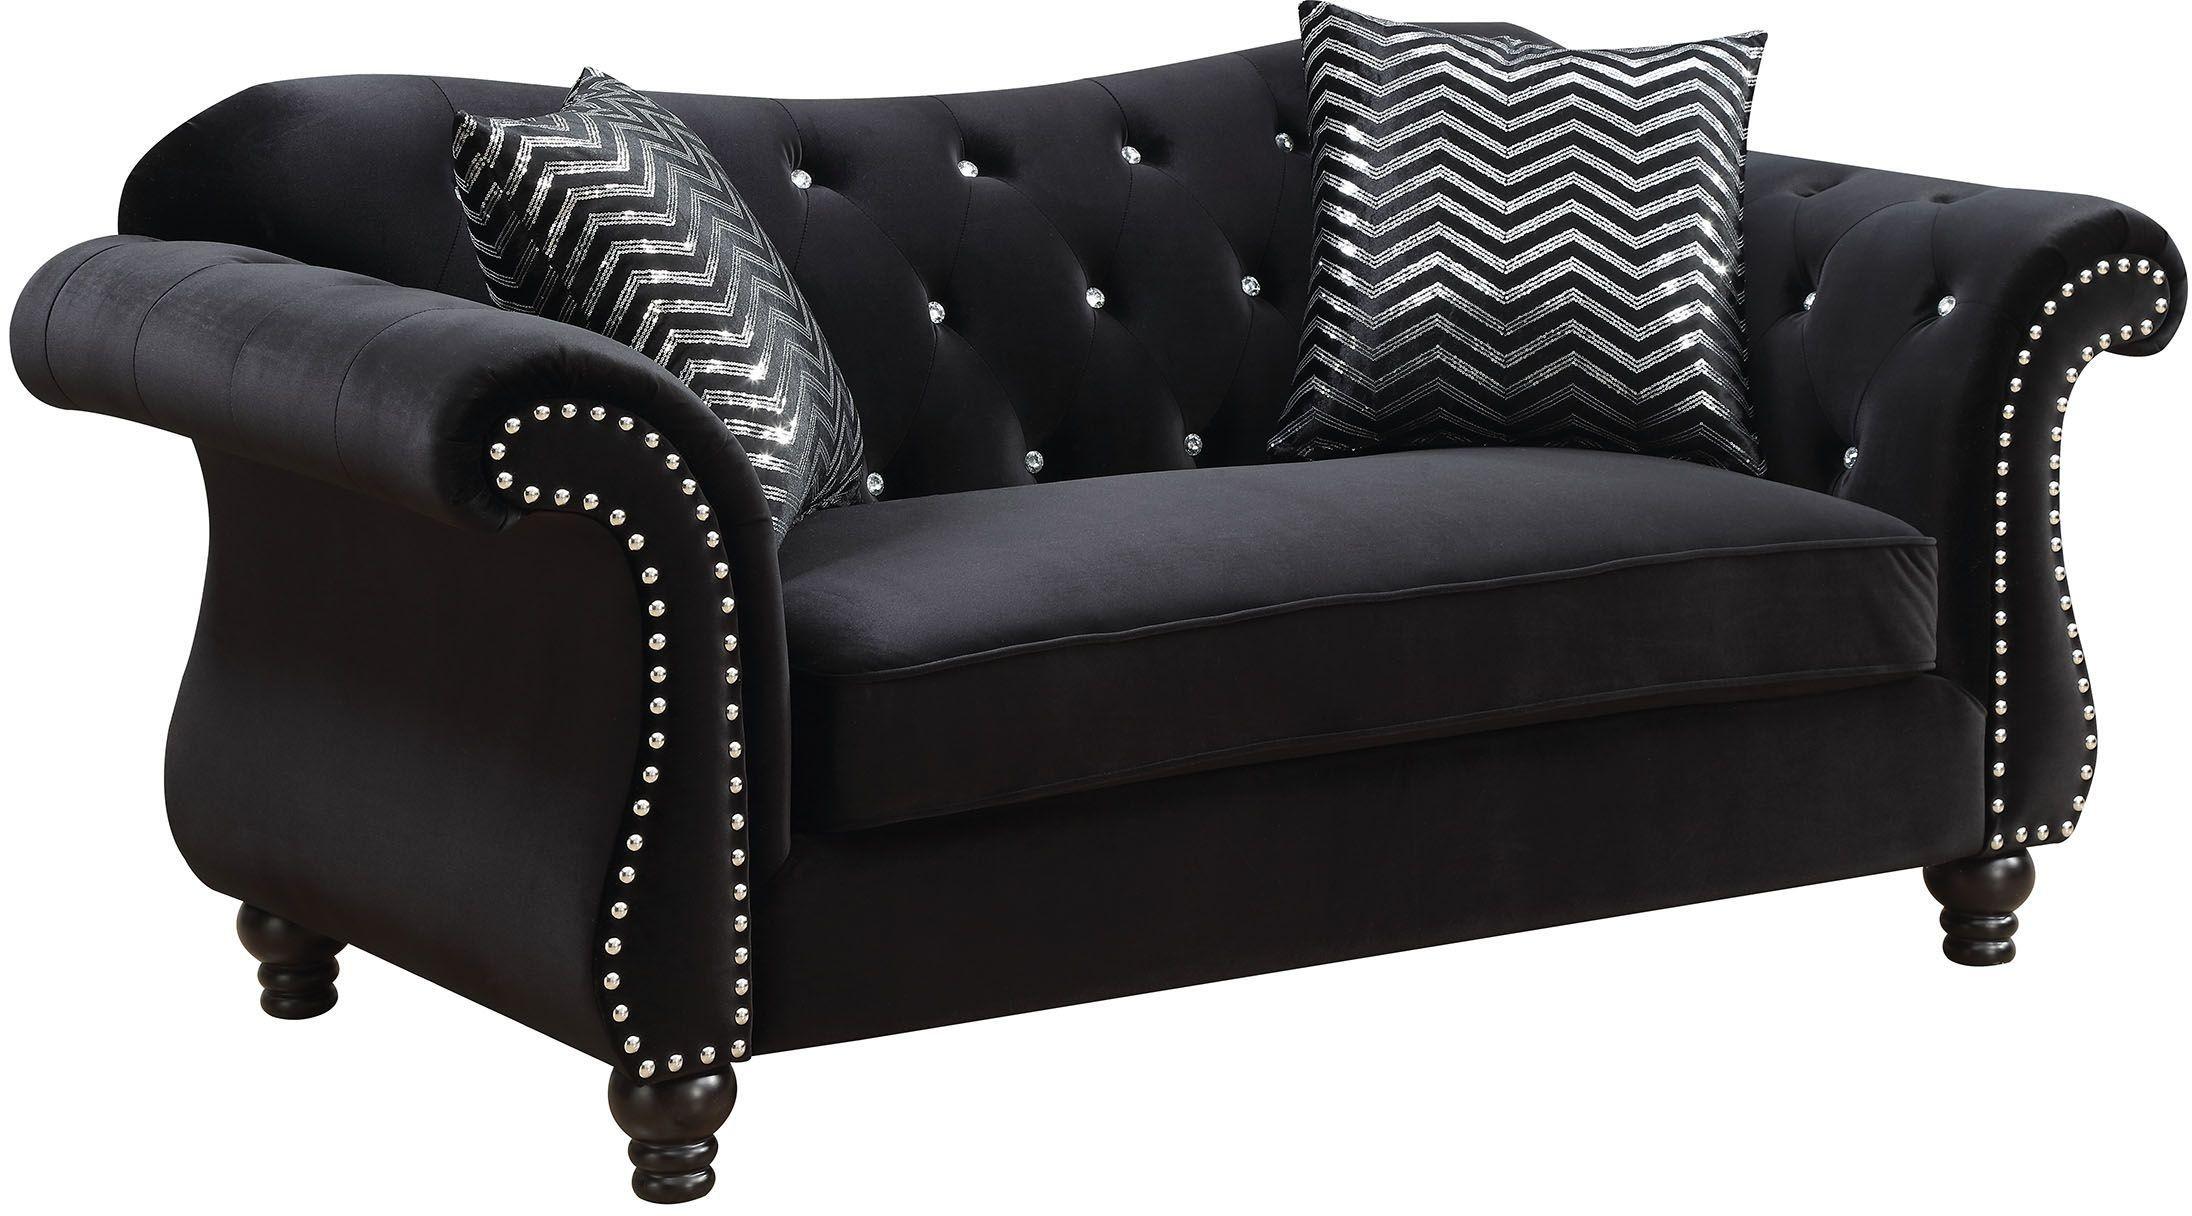 Furniture Of America Jolanda I Black Living Room Set Jolanda